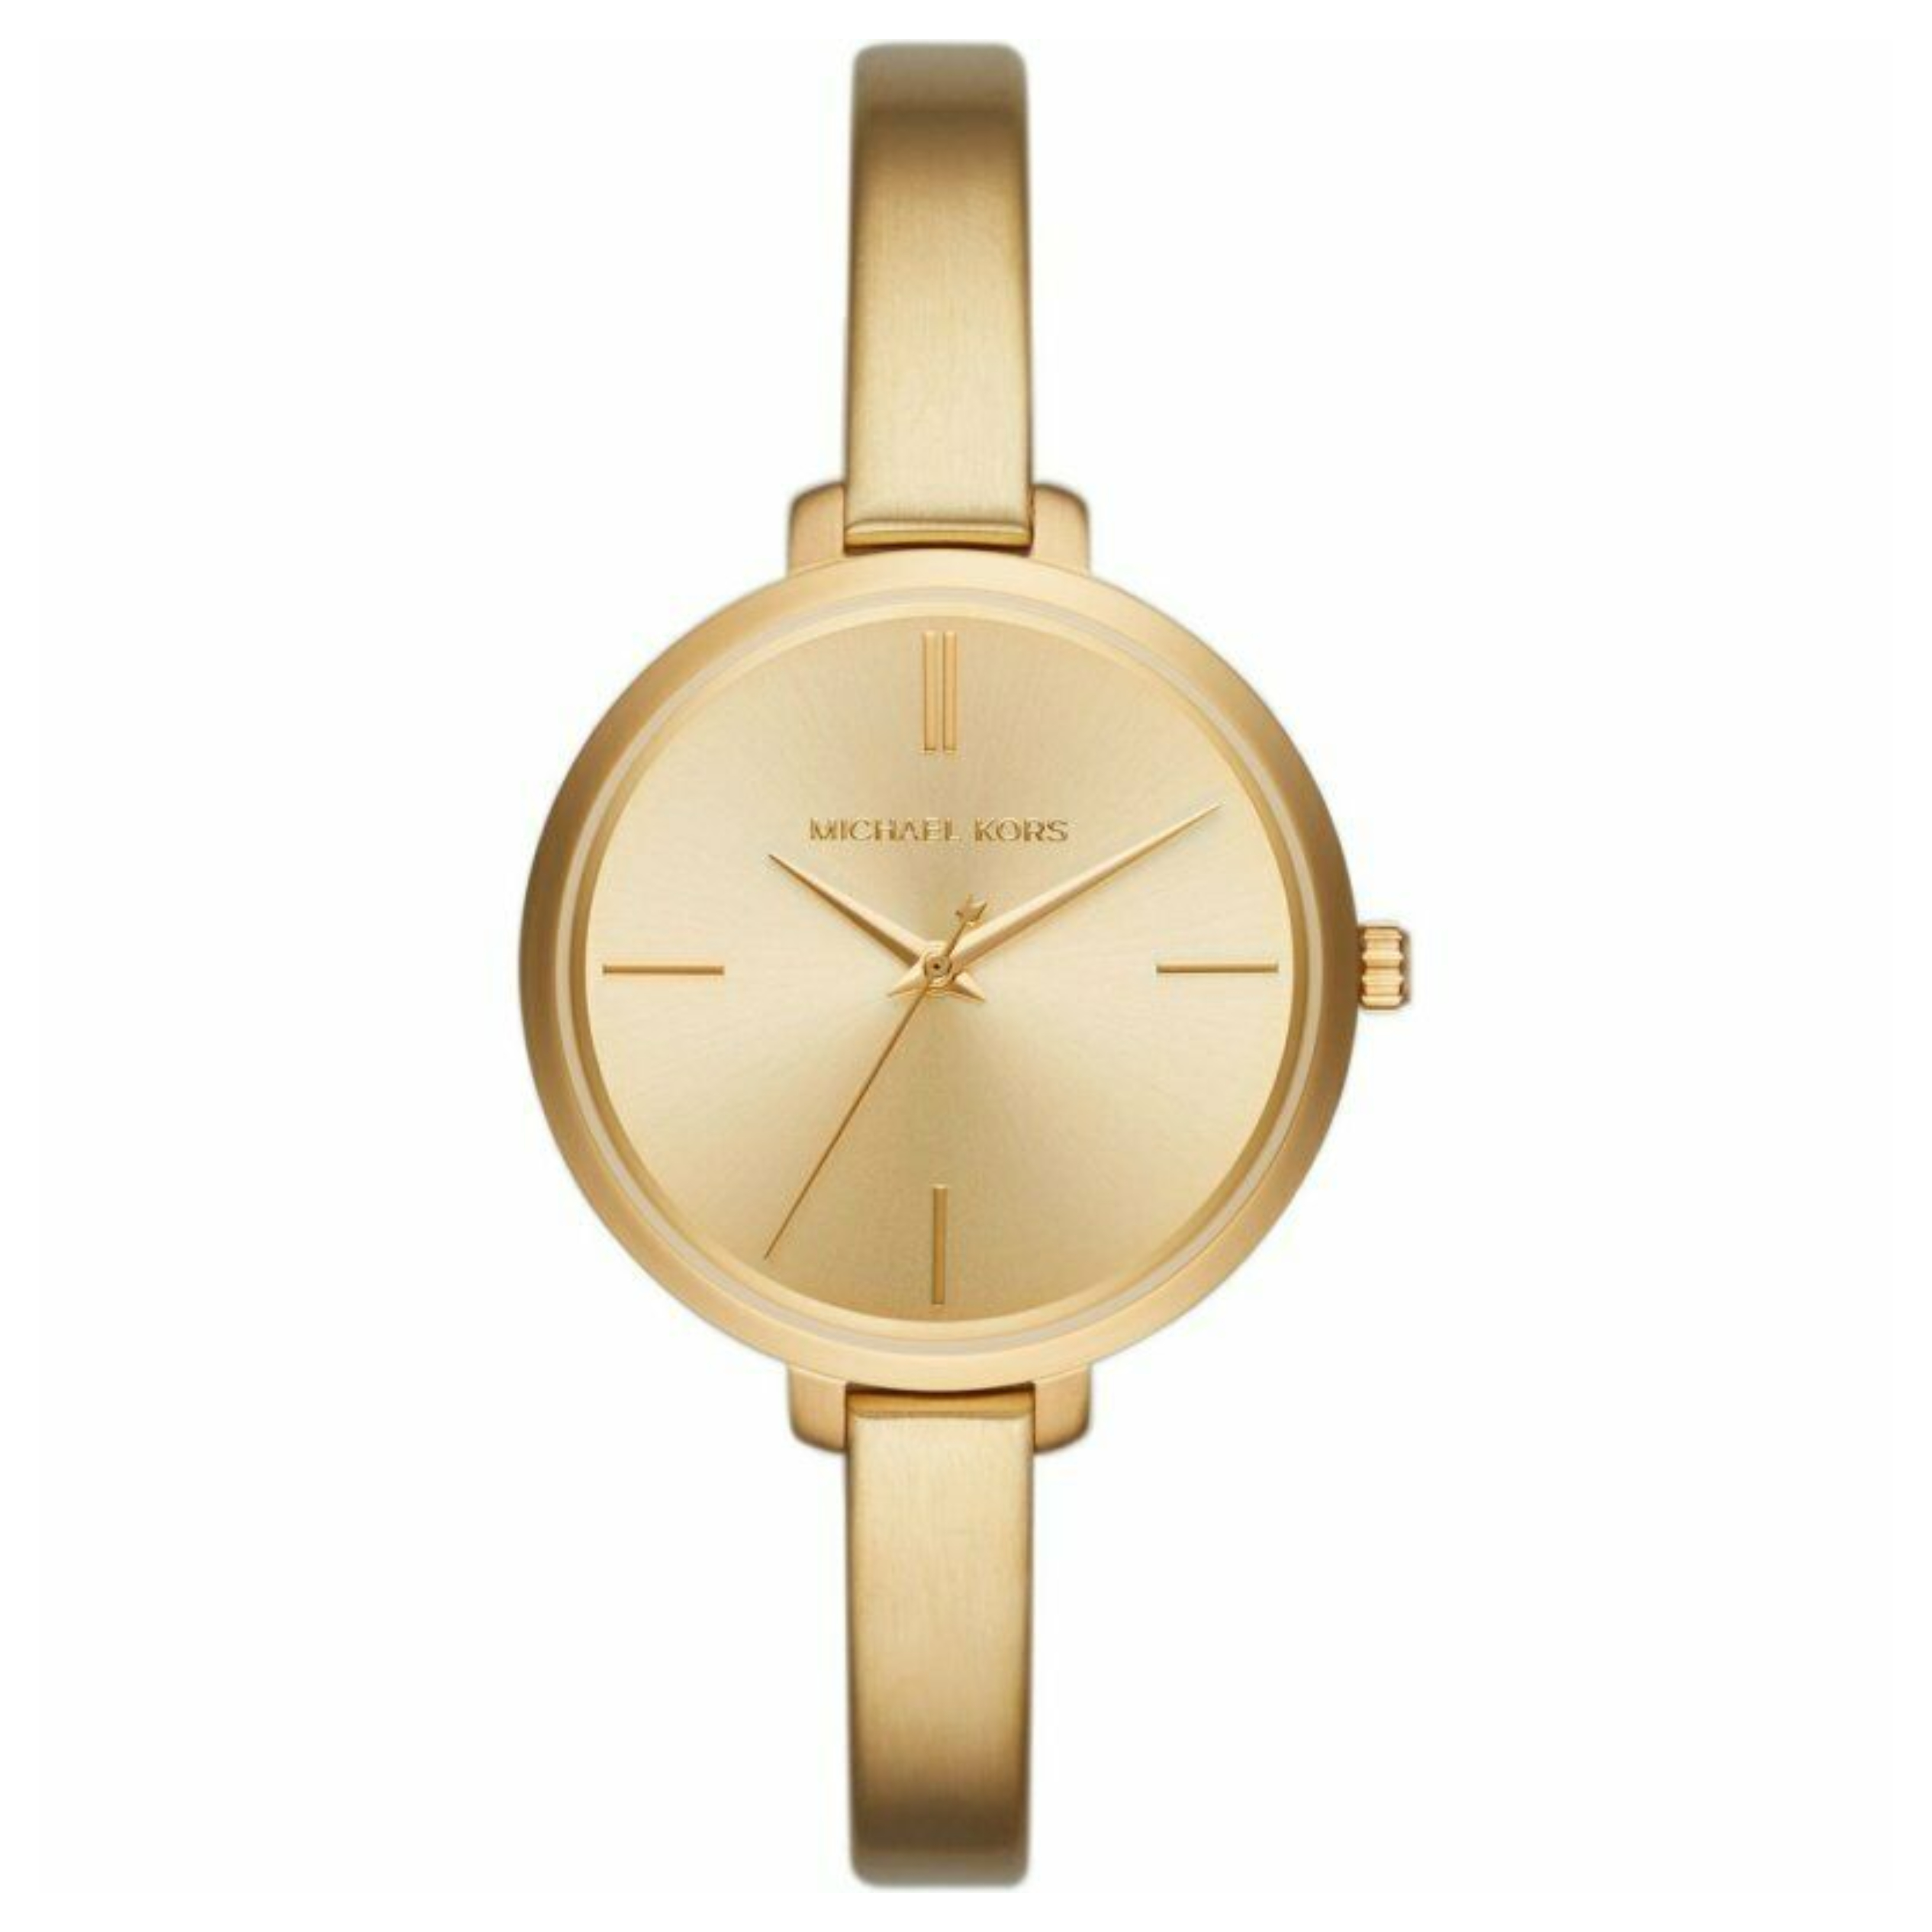 f7187784d929 Michael Kors Jaryn Las Watch Mk3546 Gold Tone Dial Bangle Bracelet Strap  Sustuu